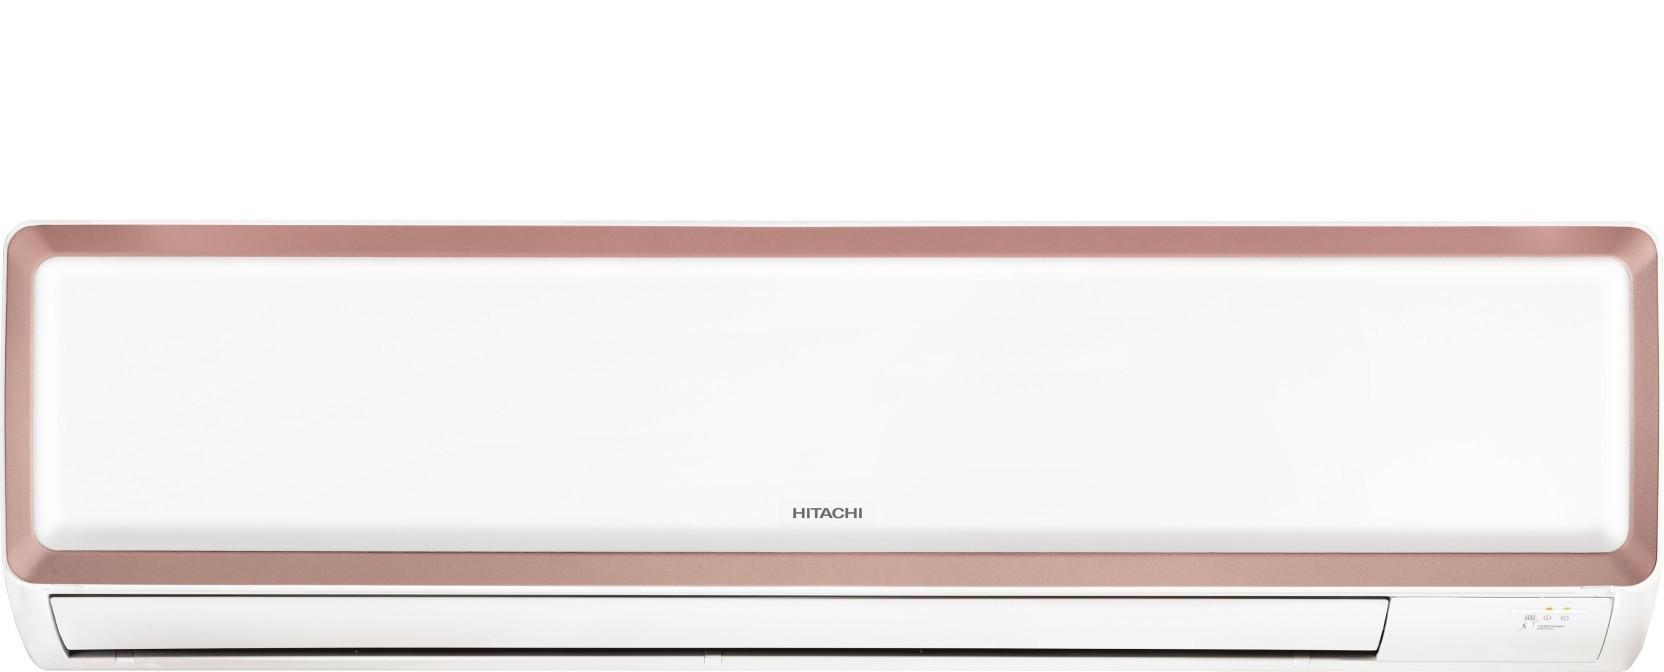 Hitachi 1.5 Ton Inverter (3 Star) Split AC  - White(RSI/CSI/ESI-318EAEA, Copper Condenser) (Hitachi)  Buy Online